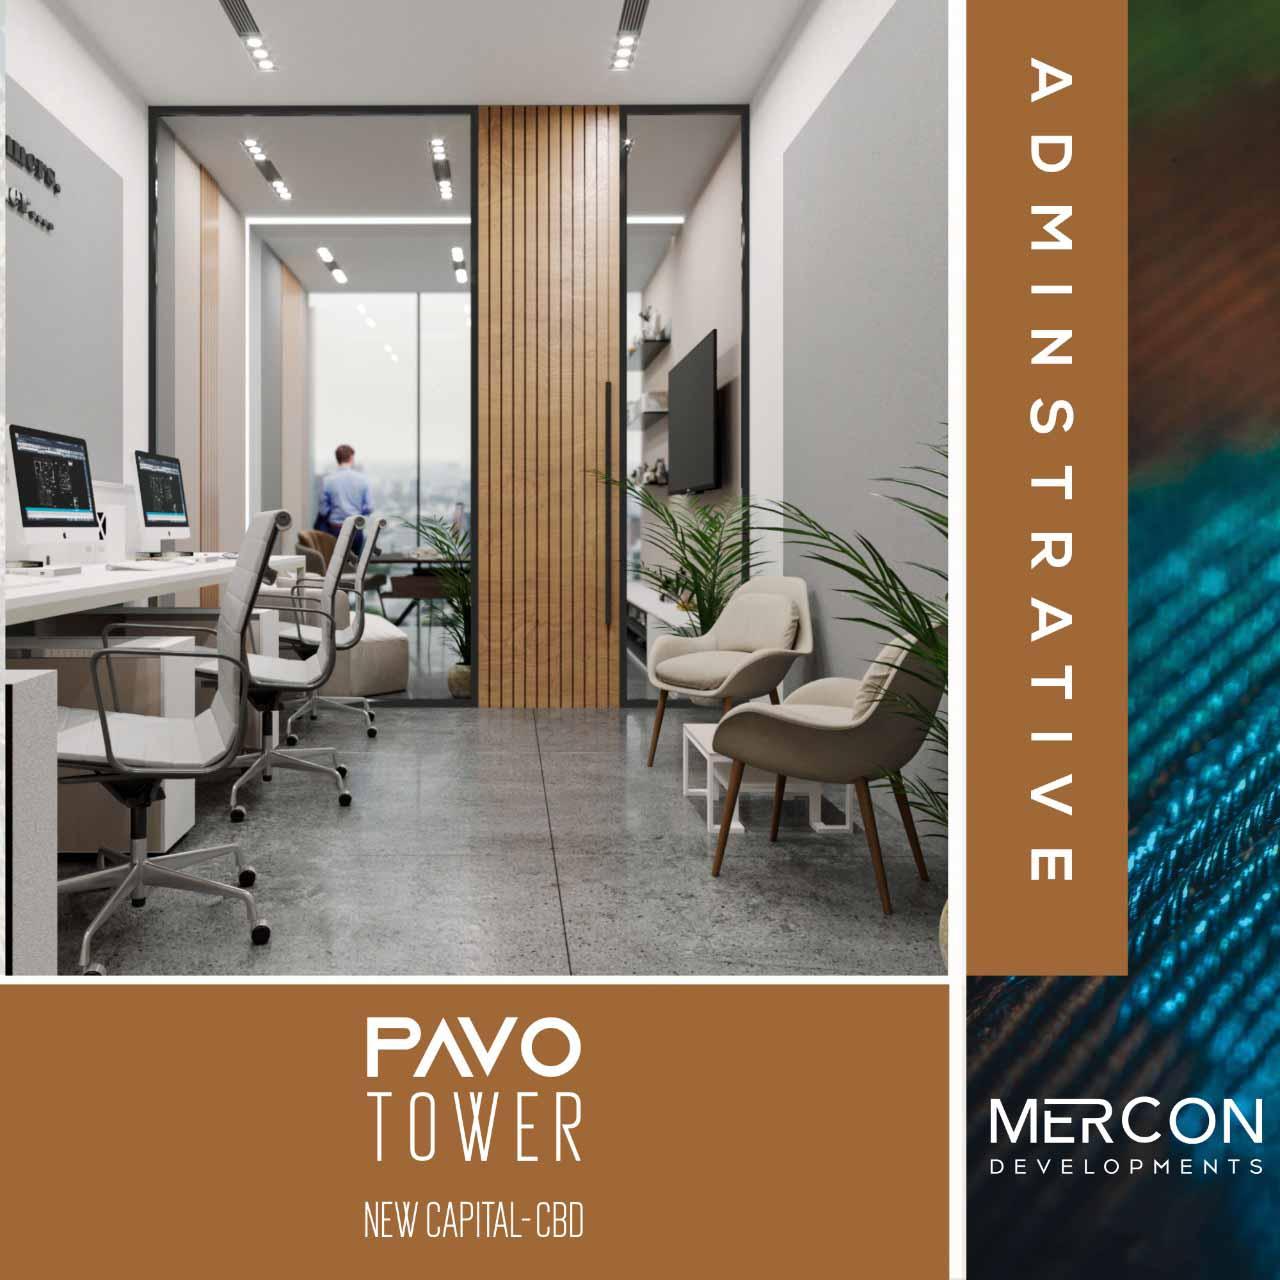 Mercon Developments 3 شركة ميركون للتطوير العقاري